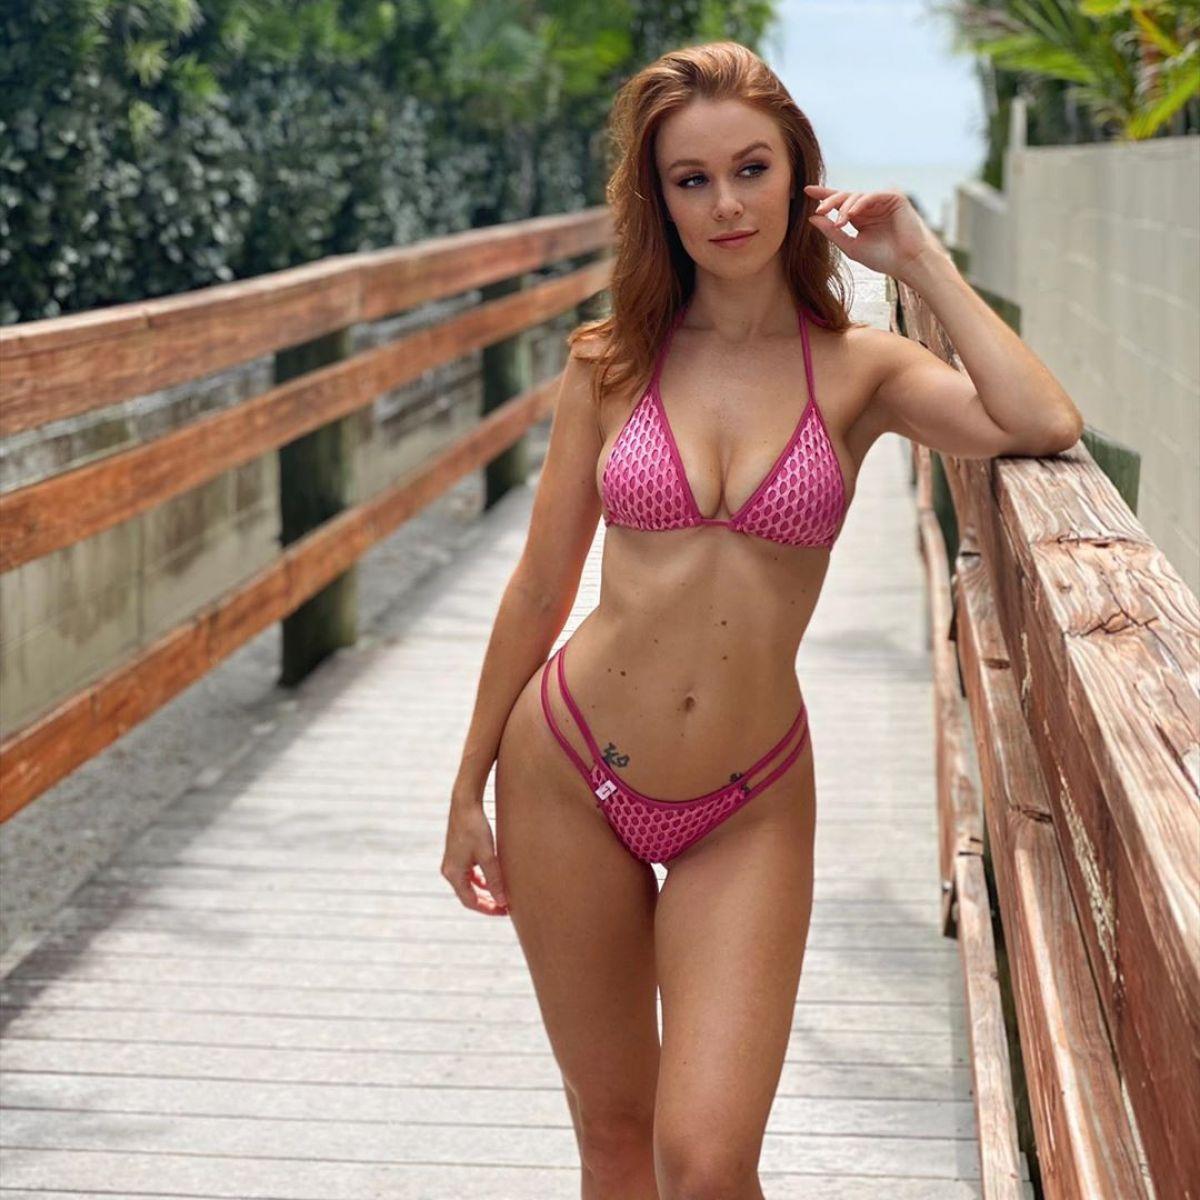 LEANNA DECKER in Bikini - Instagram Photos 09/28/2020